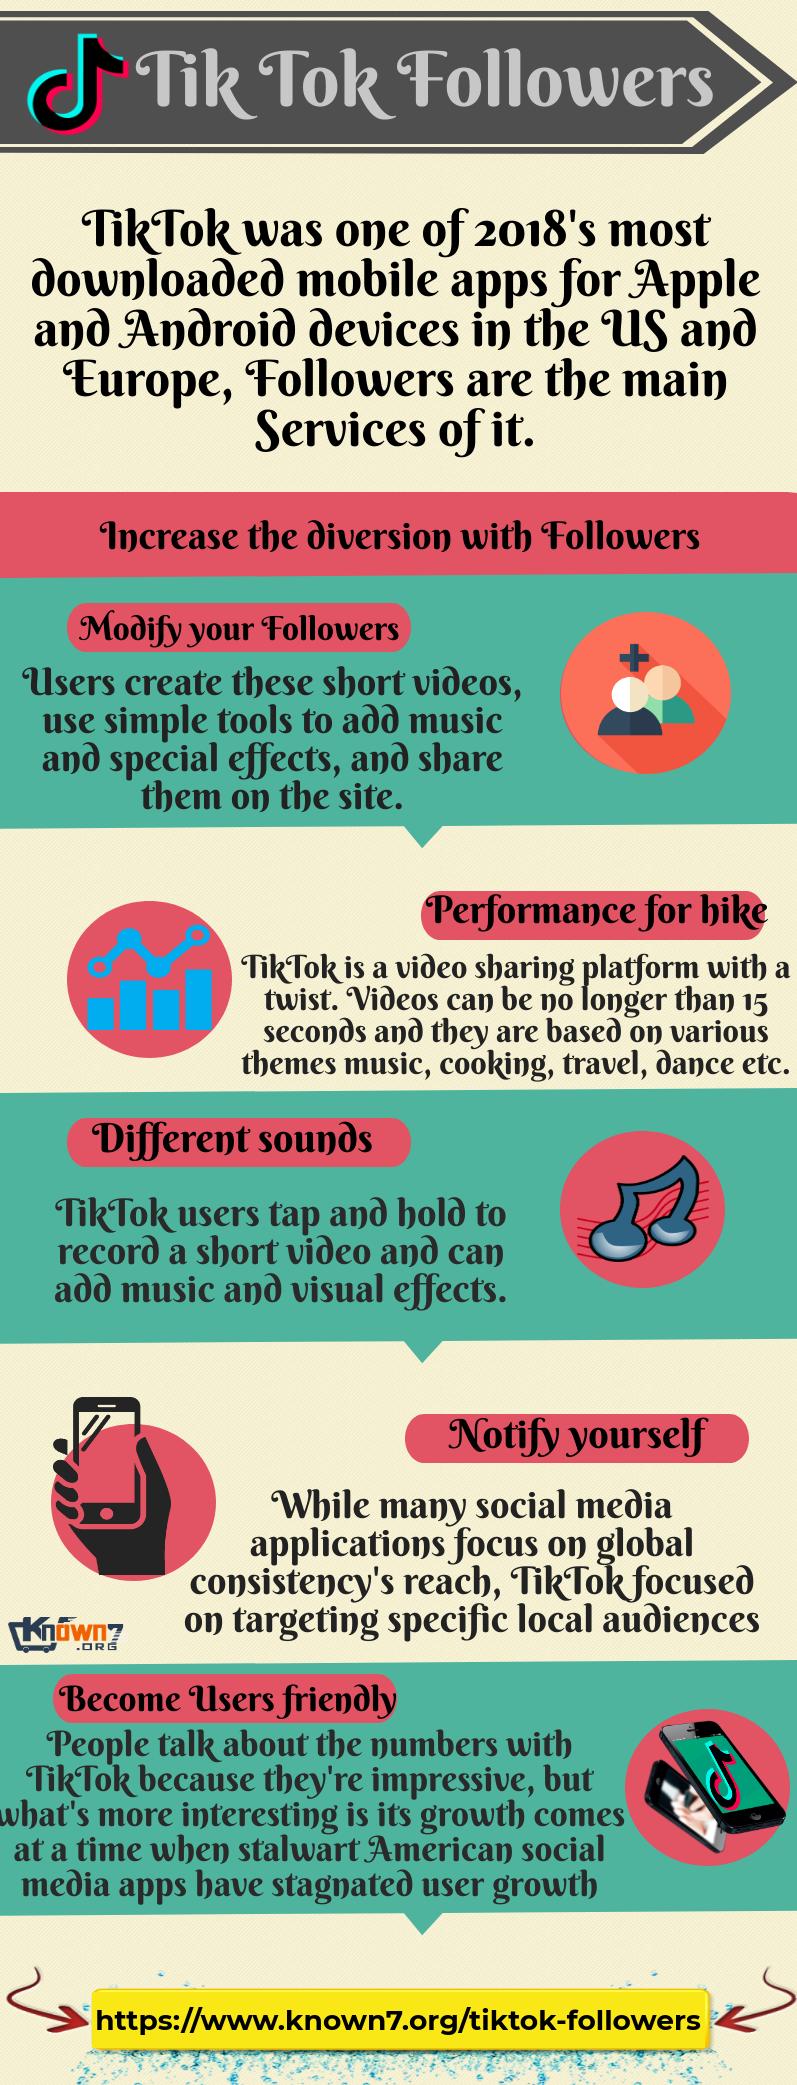 Buy Tiktok Followers And Increase Profile Growth Social Media Services Snapchat Marketing Twitter Marketing